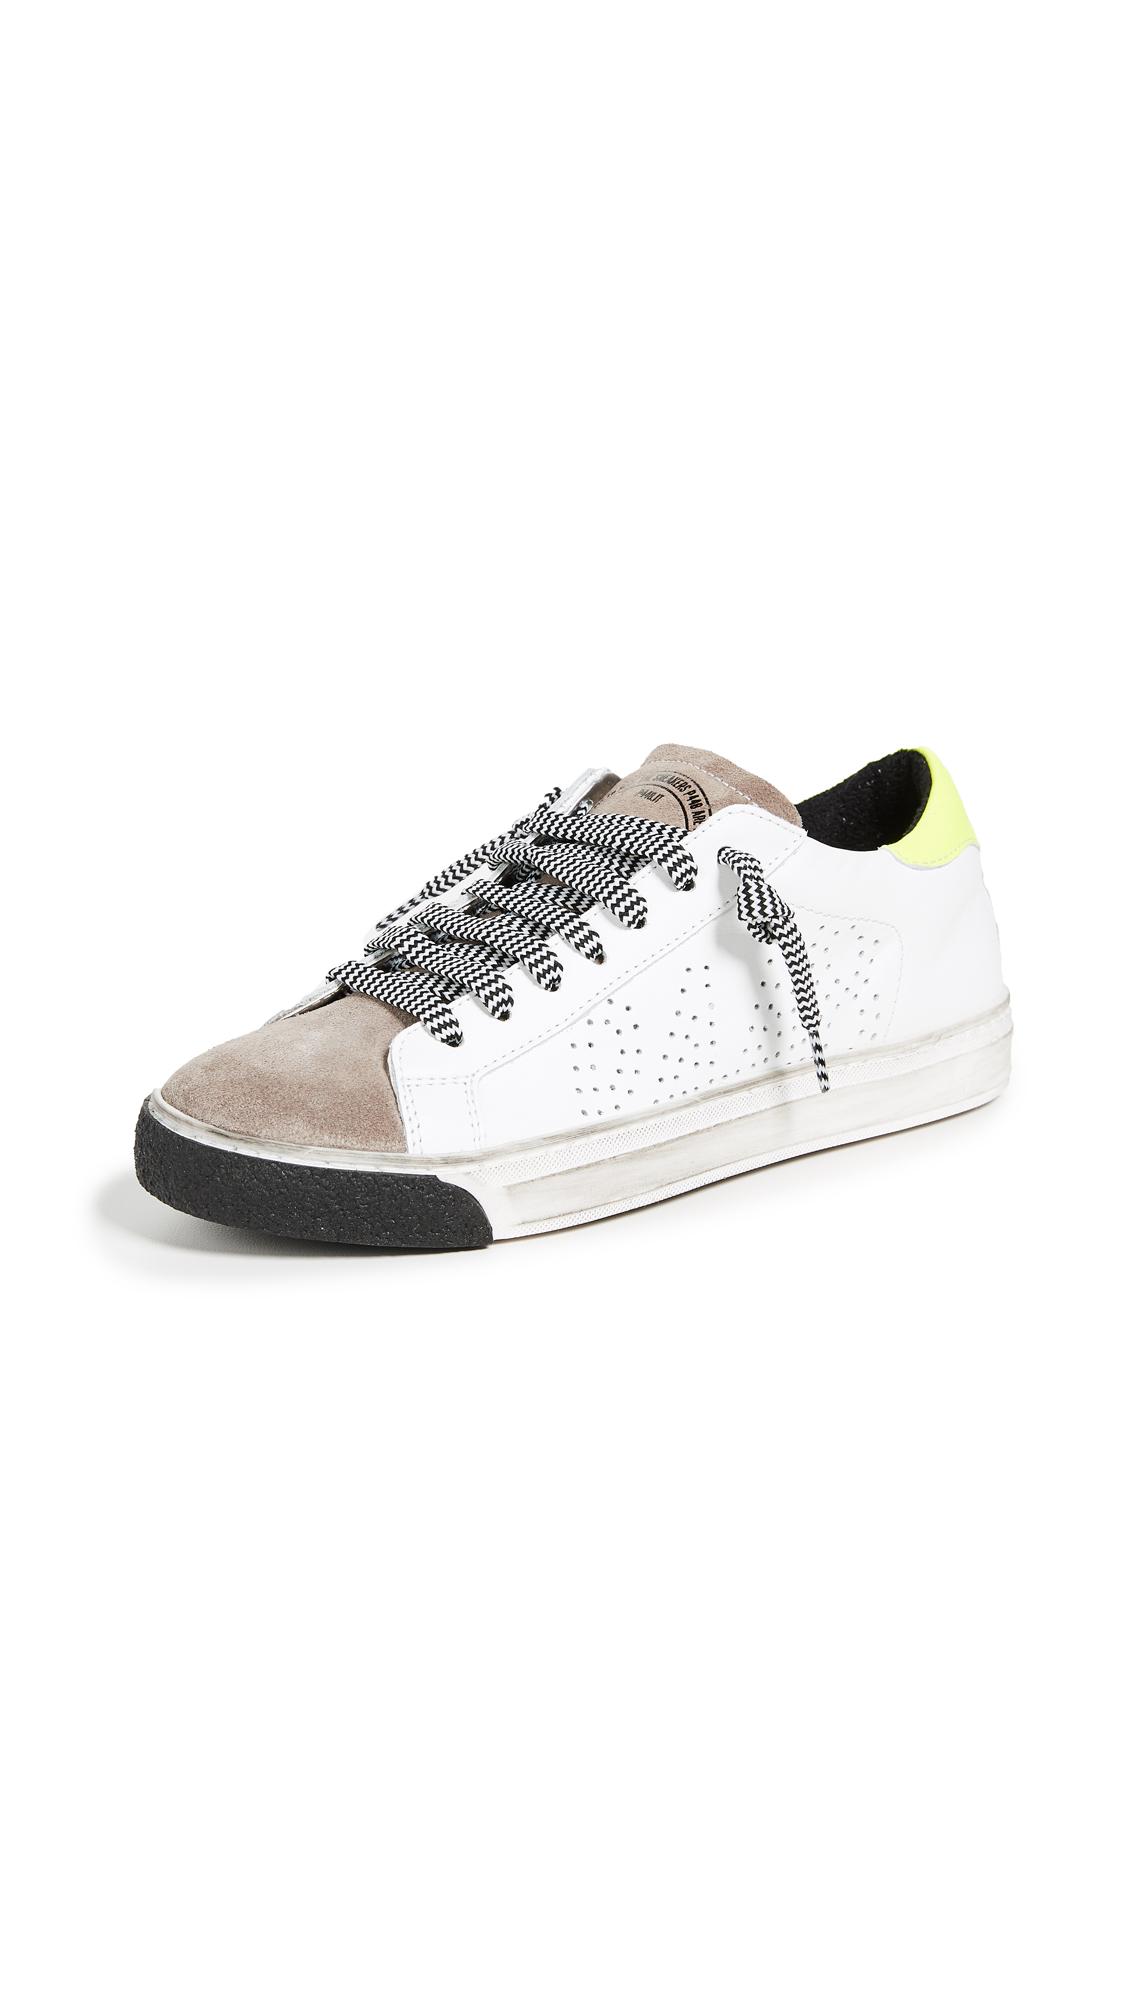 P448 Miami Sneakers